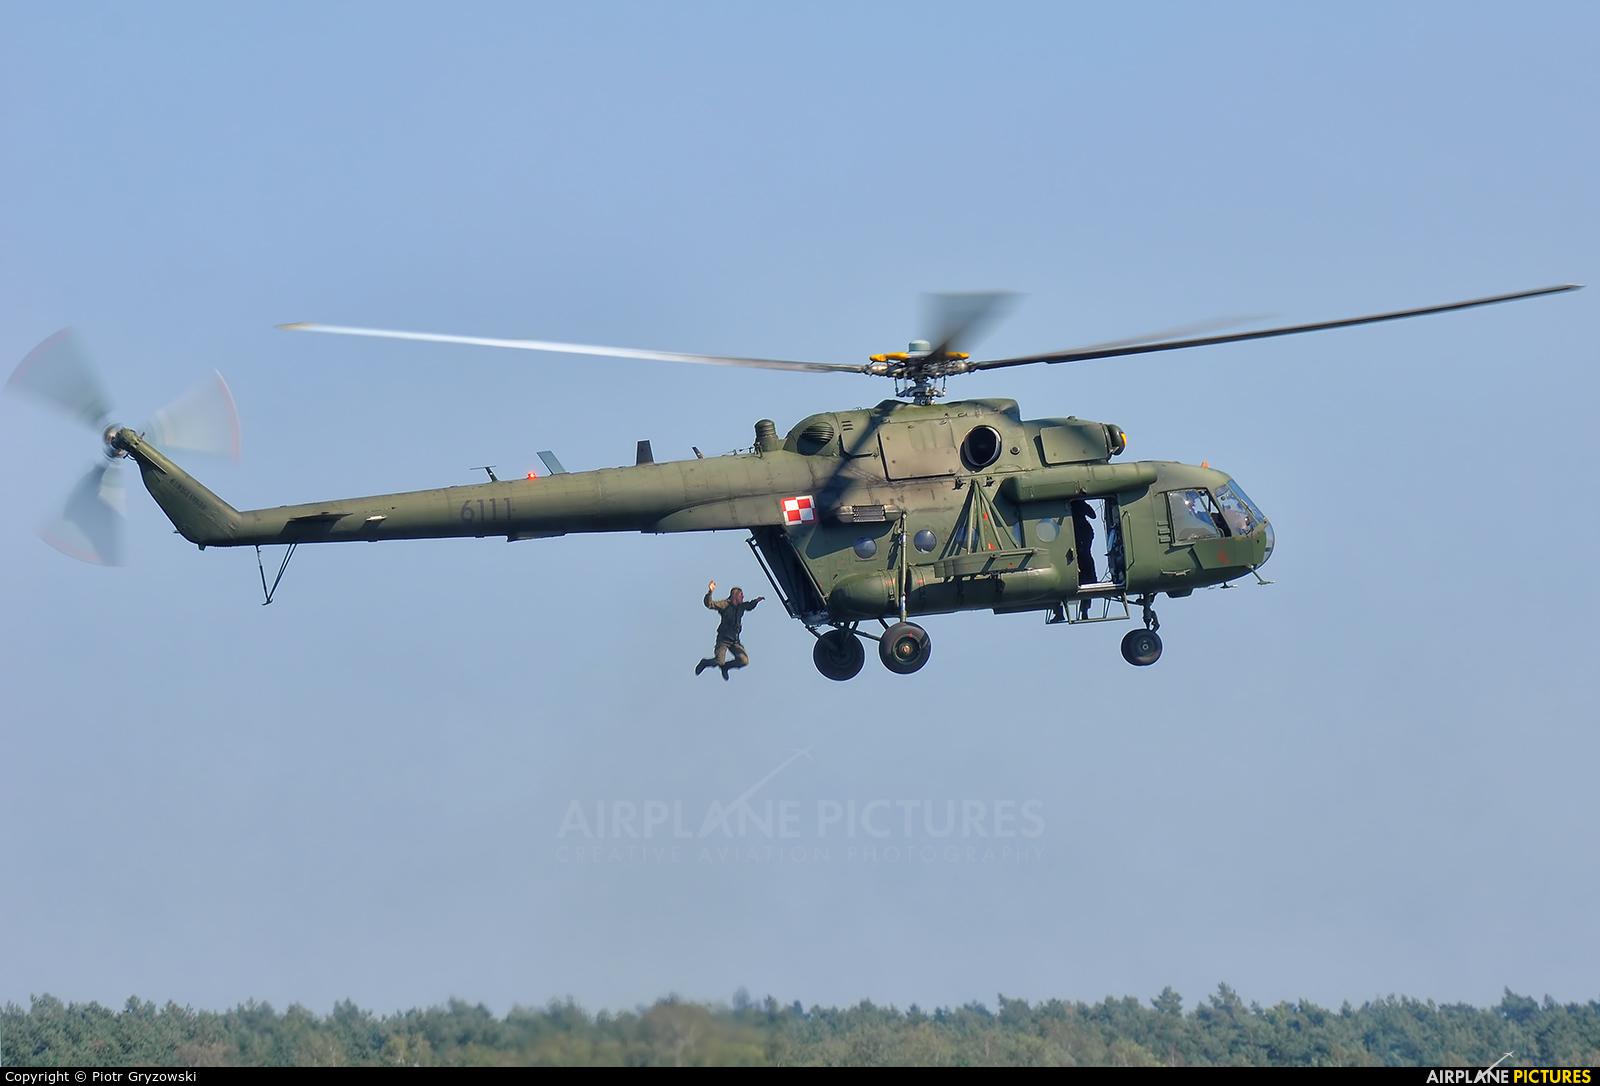 Poland - Army 6111 aircraft at Off Airport - Poland